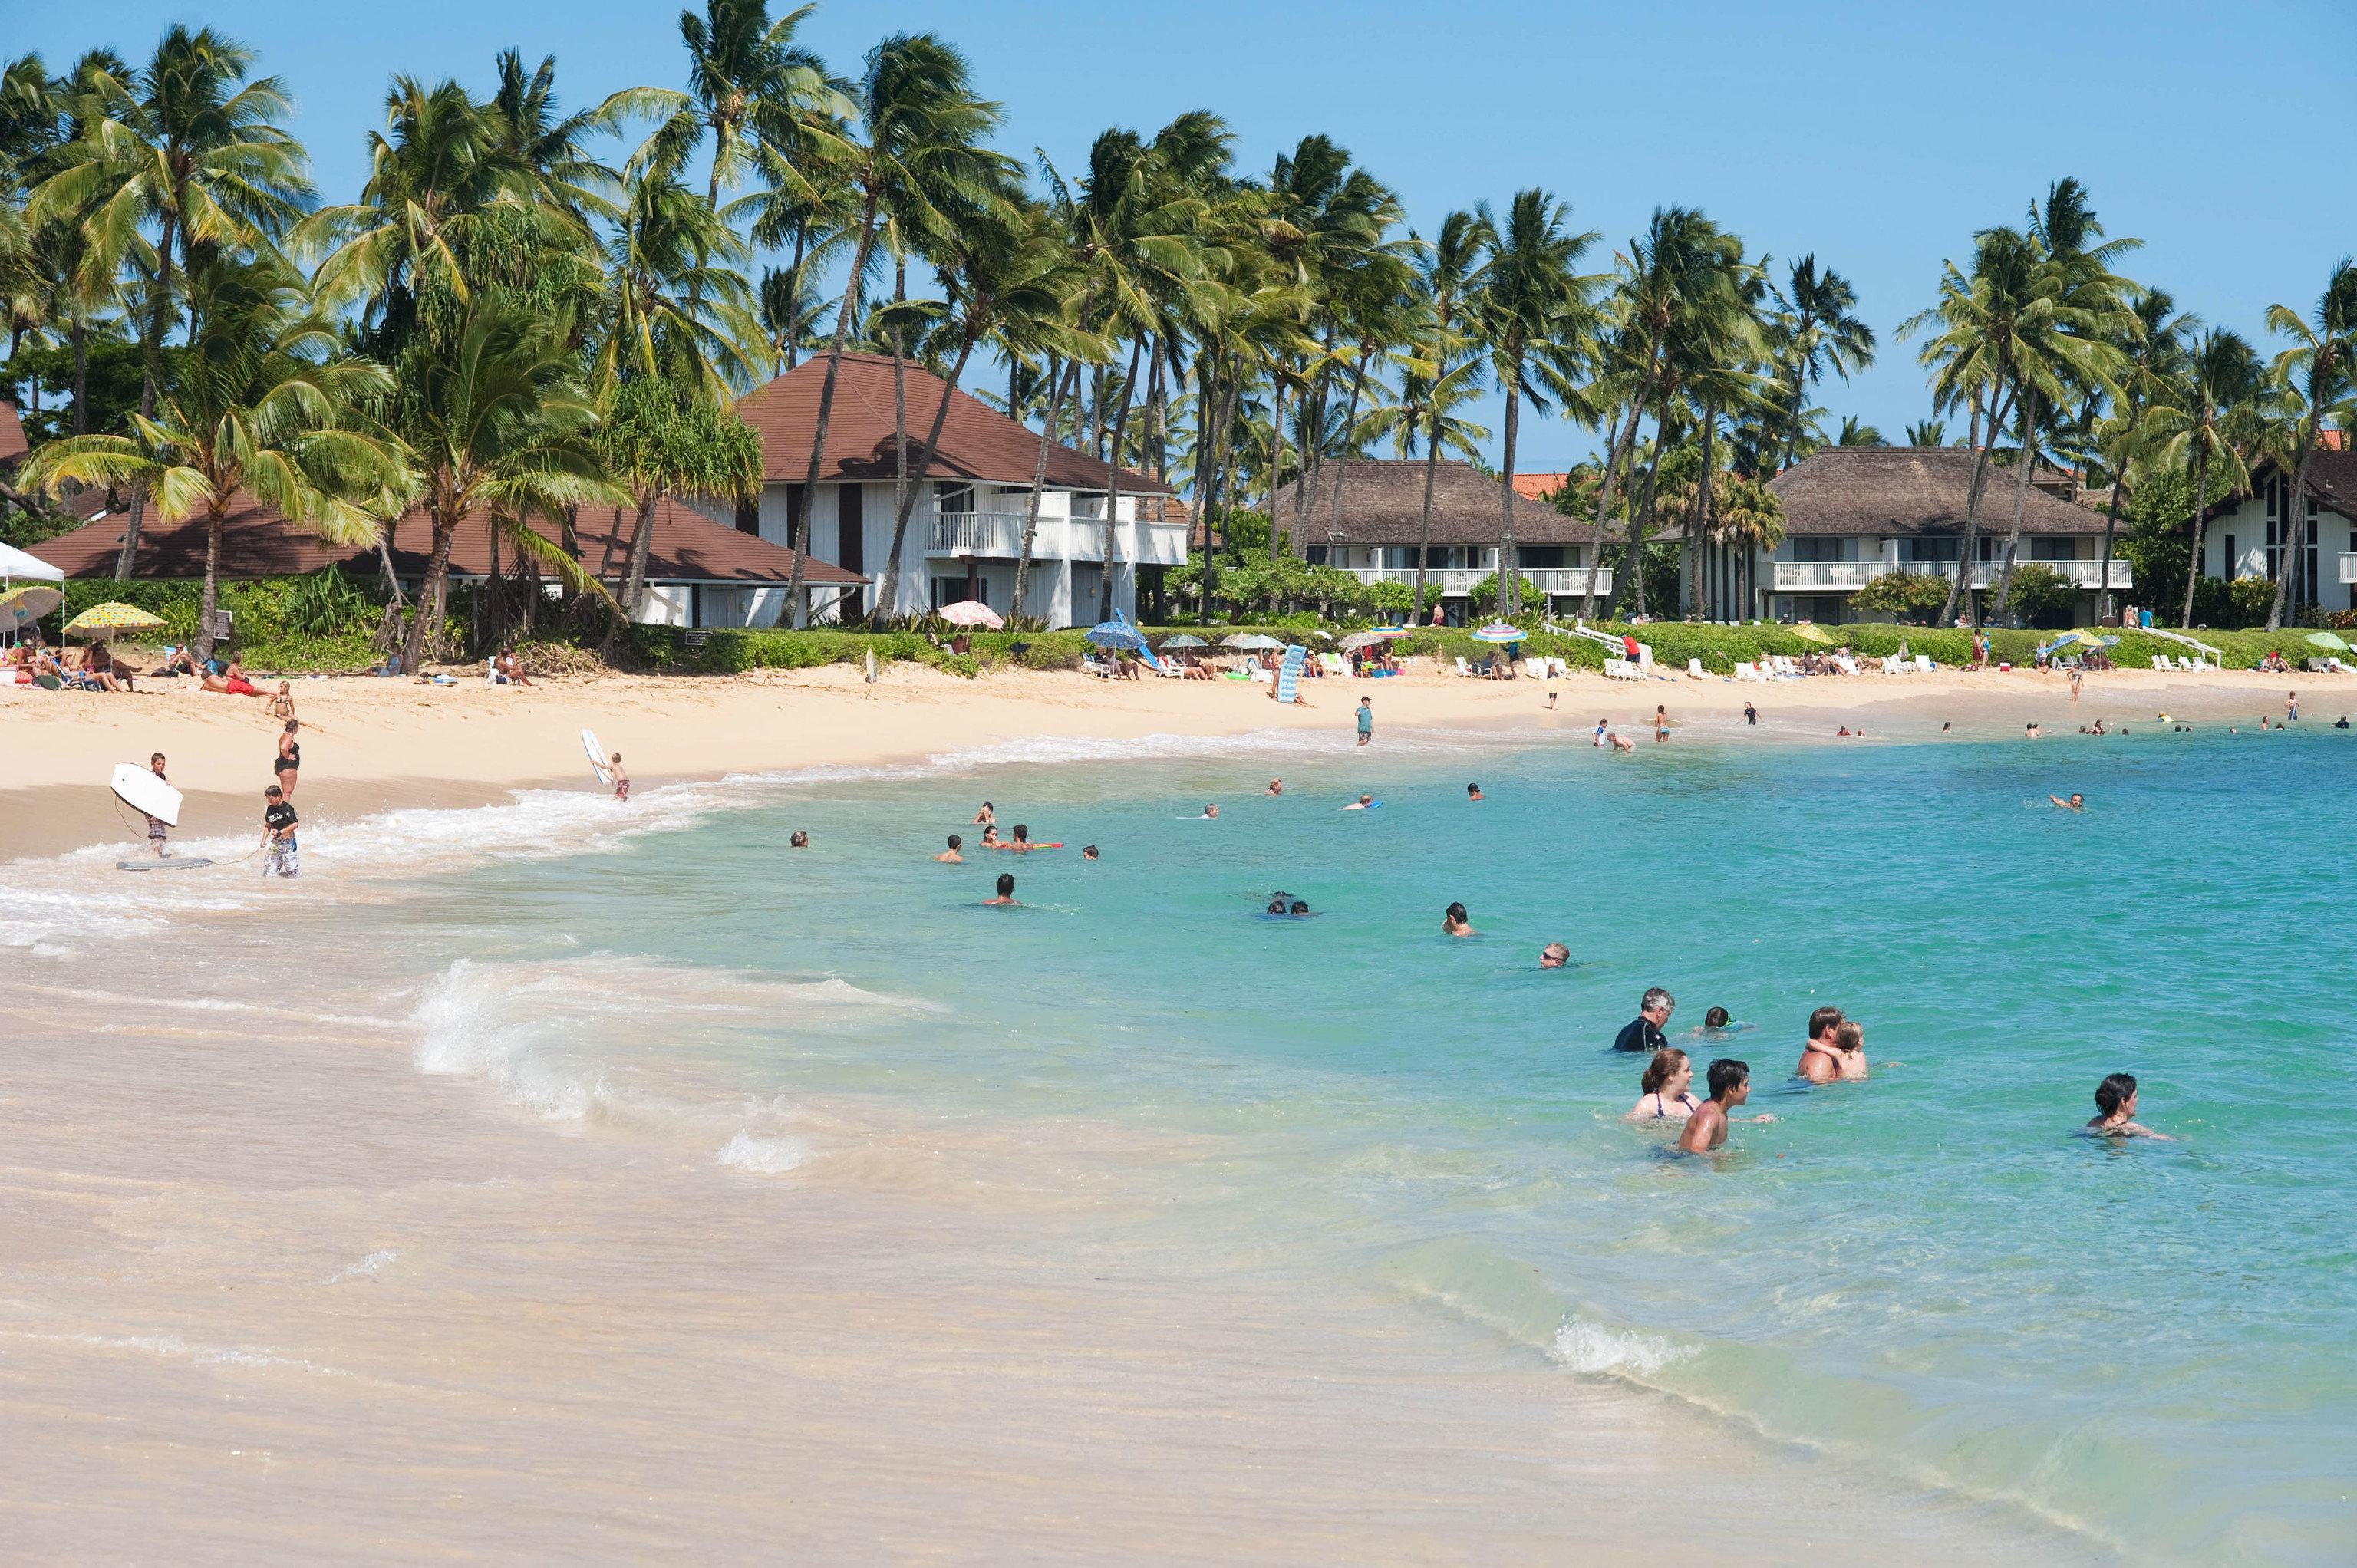 tree sky water Beach leisure Sea swimming Sport water sport Resort caribbean Lagoon swimming pool Pool tropics Water park shore palm